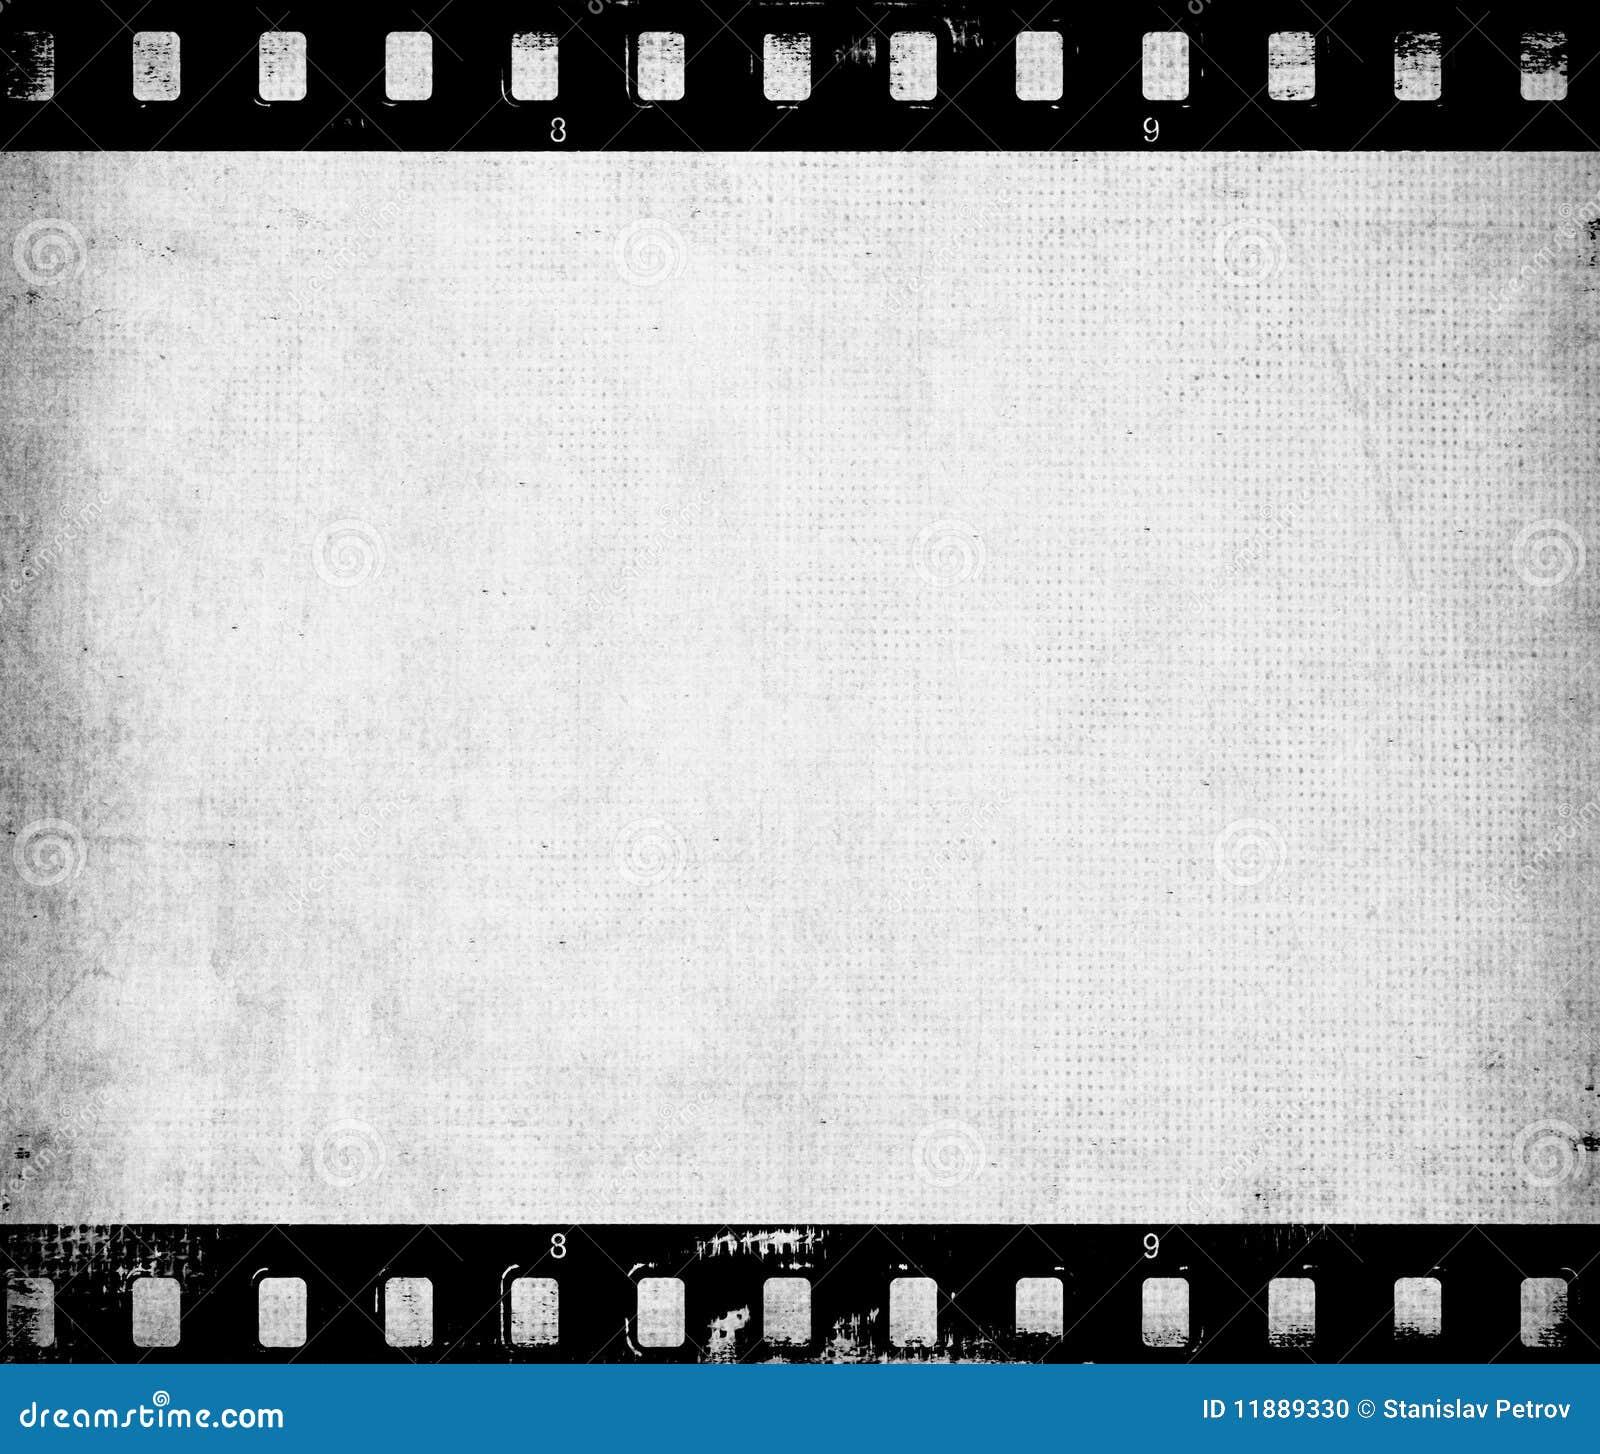 Movies essay